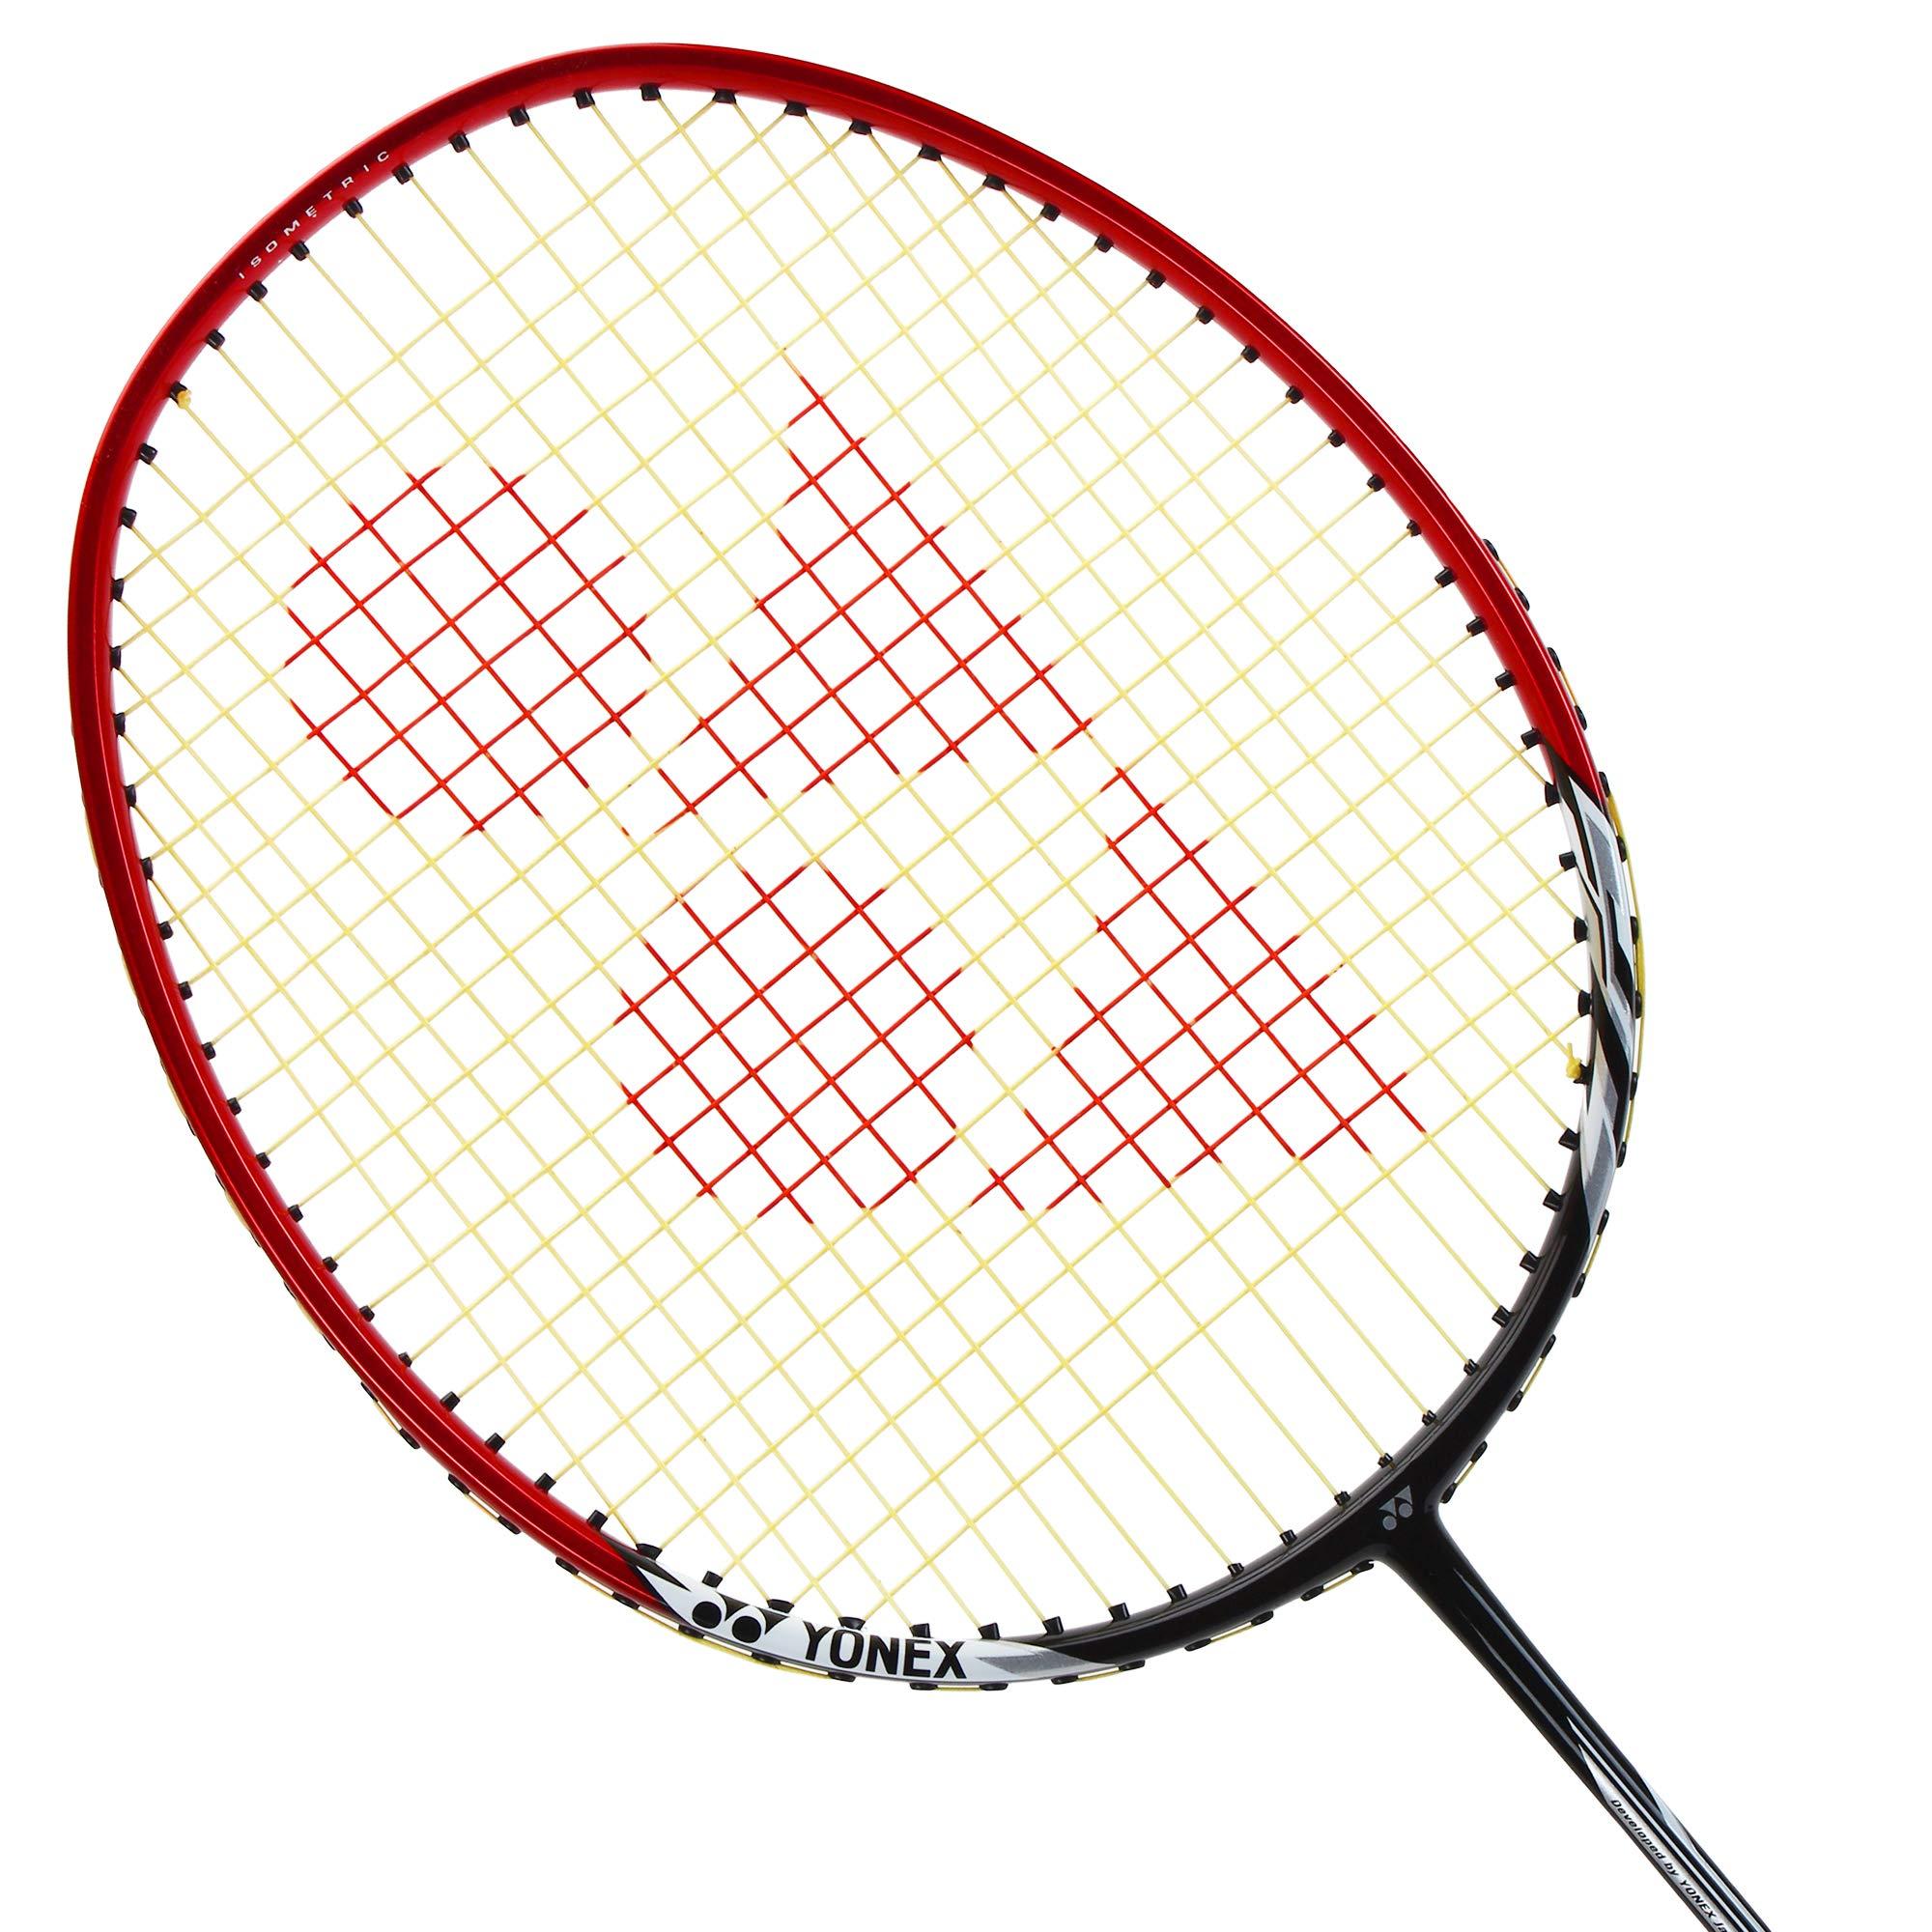 Yonex Nanoray 6000I G4-U Badminton Racquet Red by Yonex (Image #2)